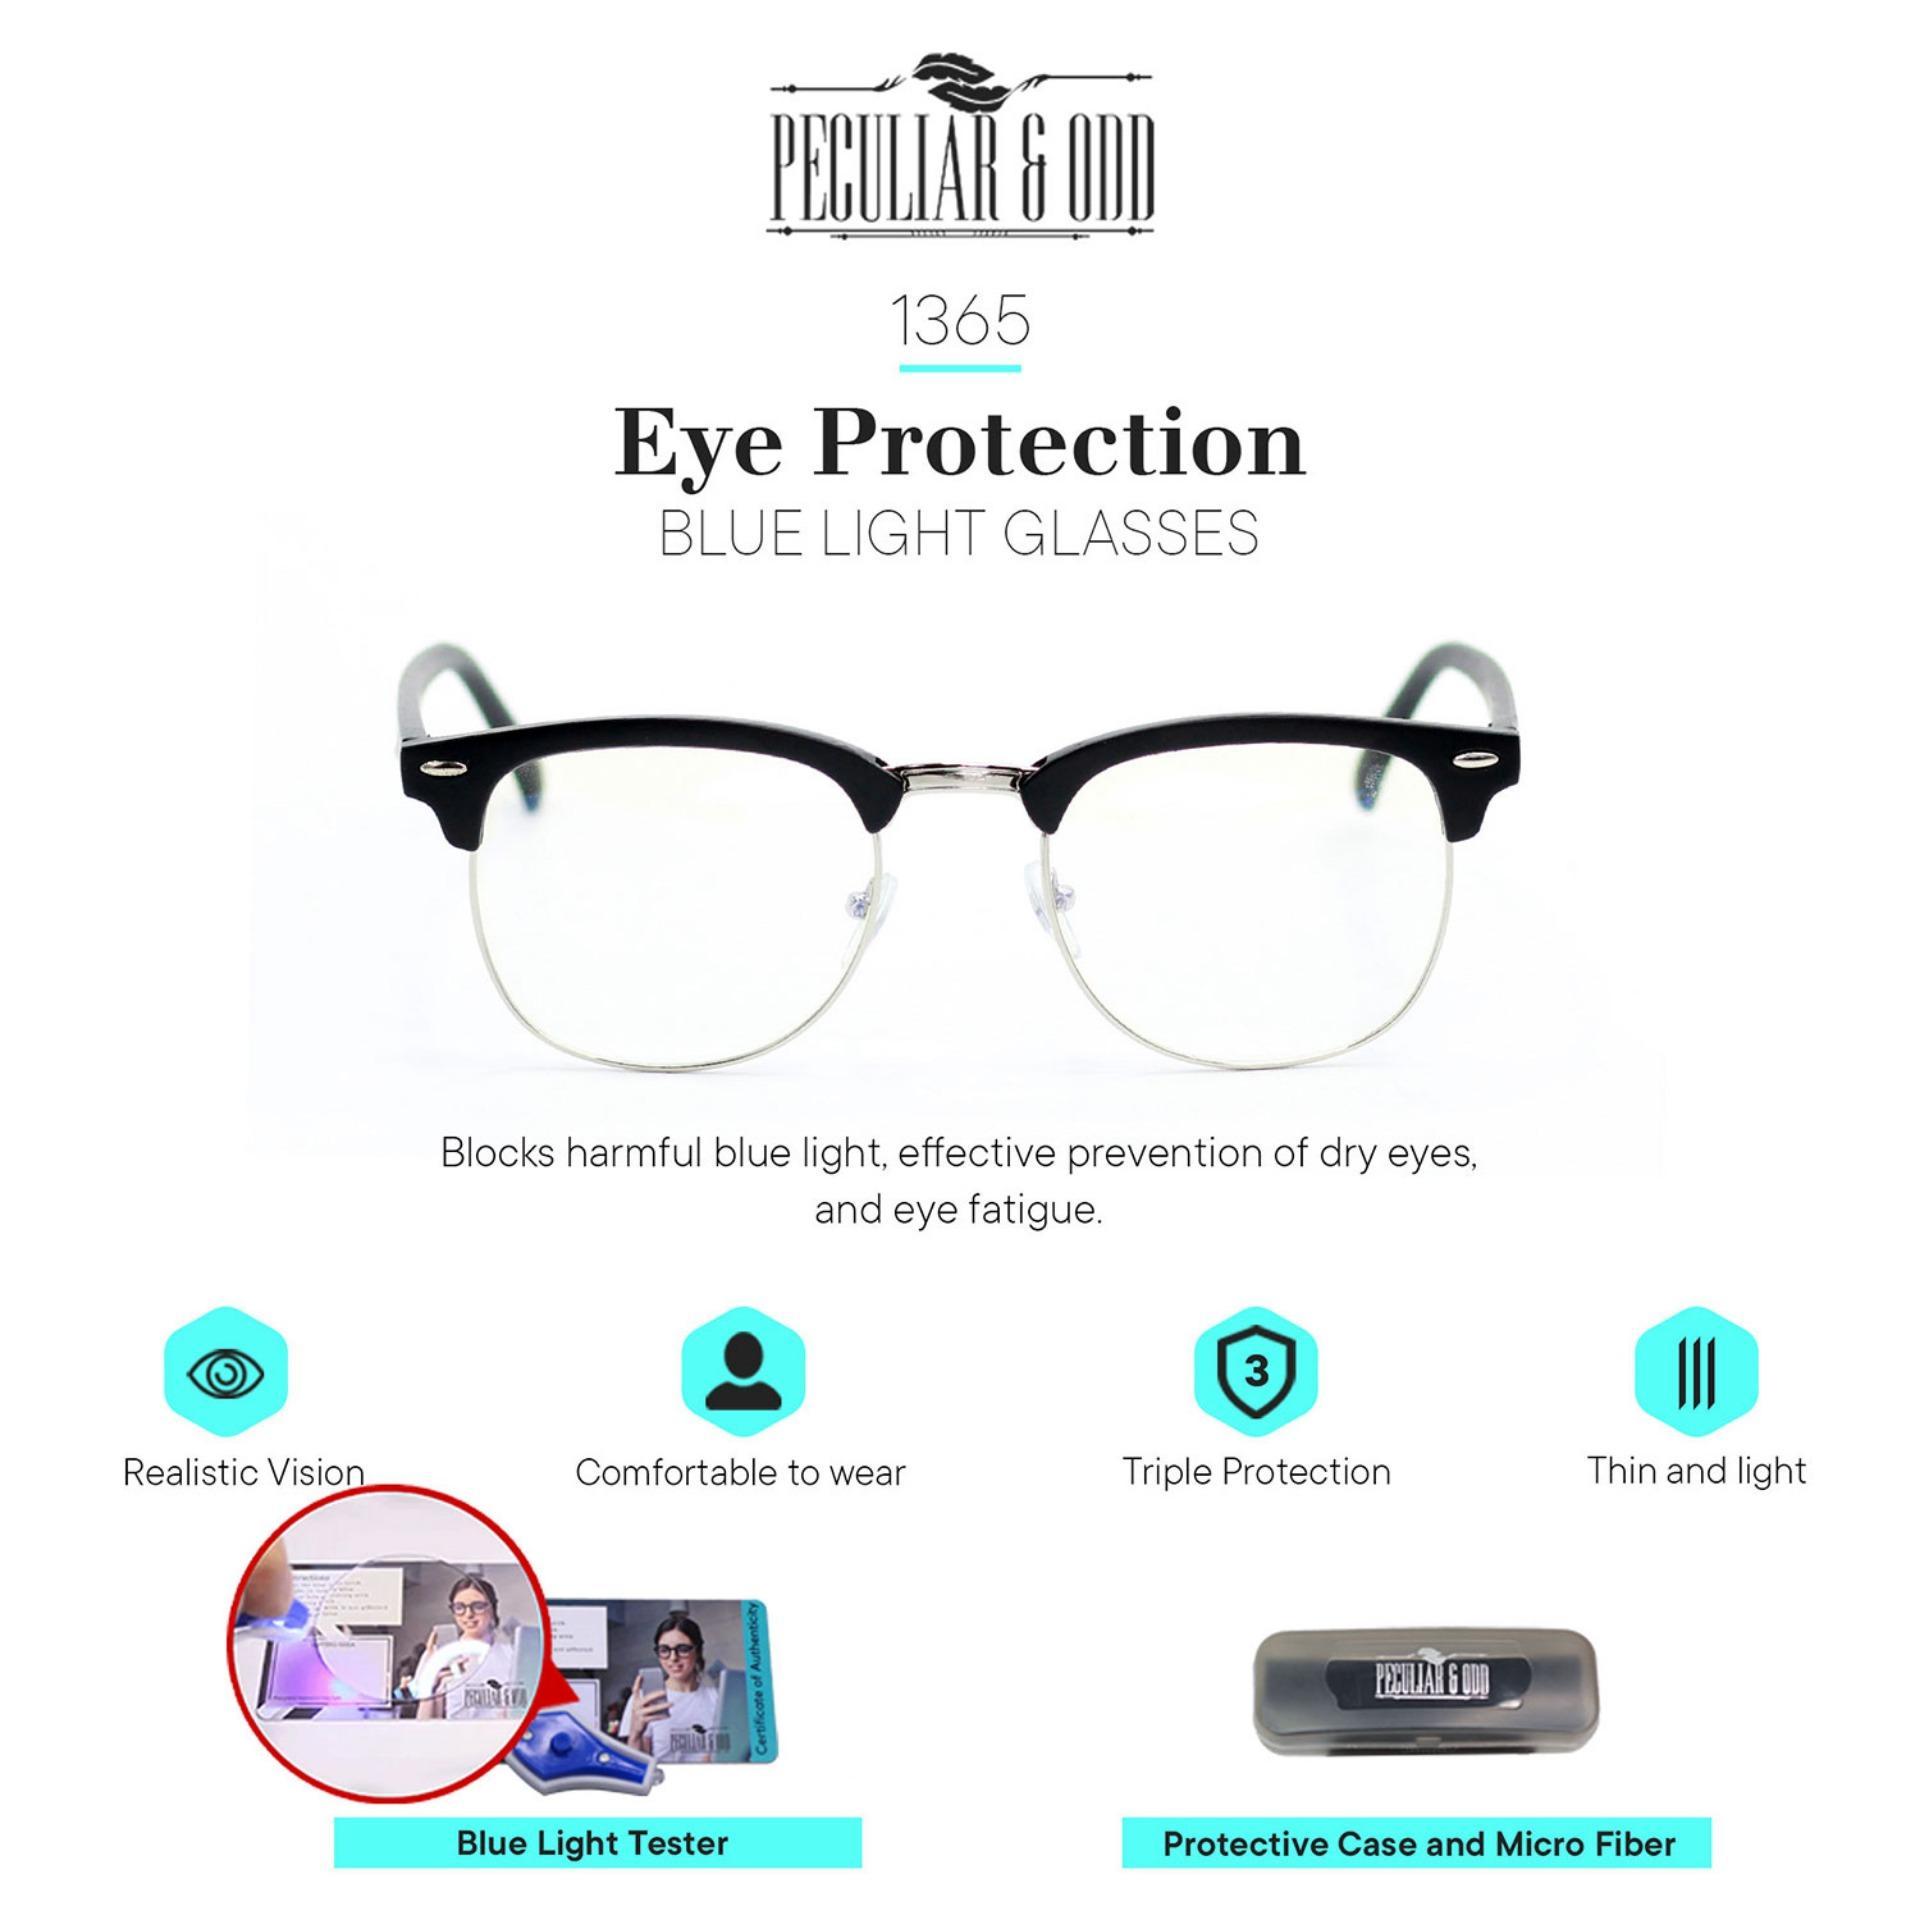 Eyeglasses For Men for sale - Mens Eyeglasses Online Deals